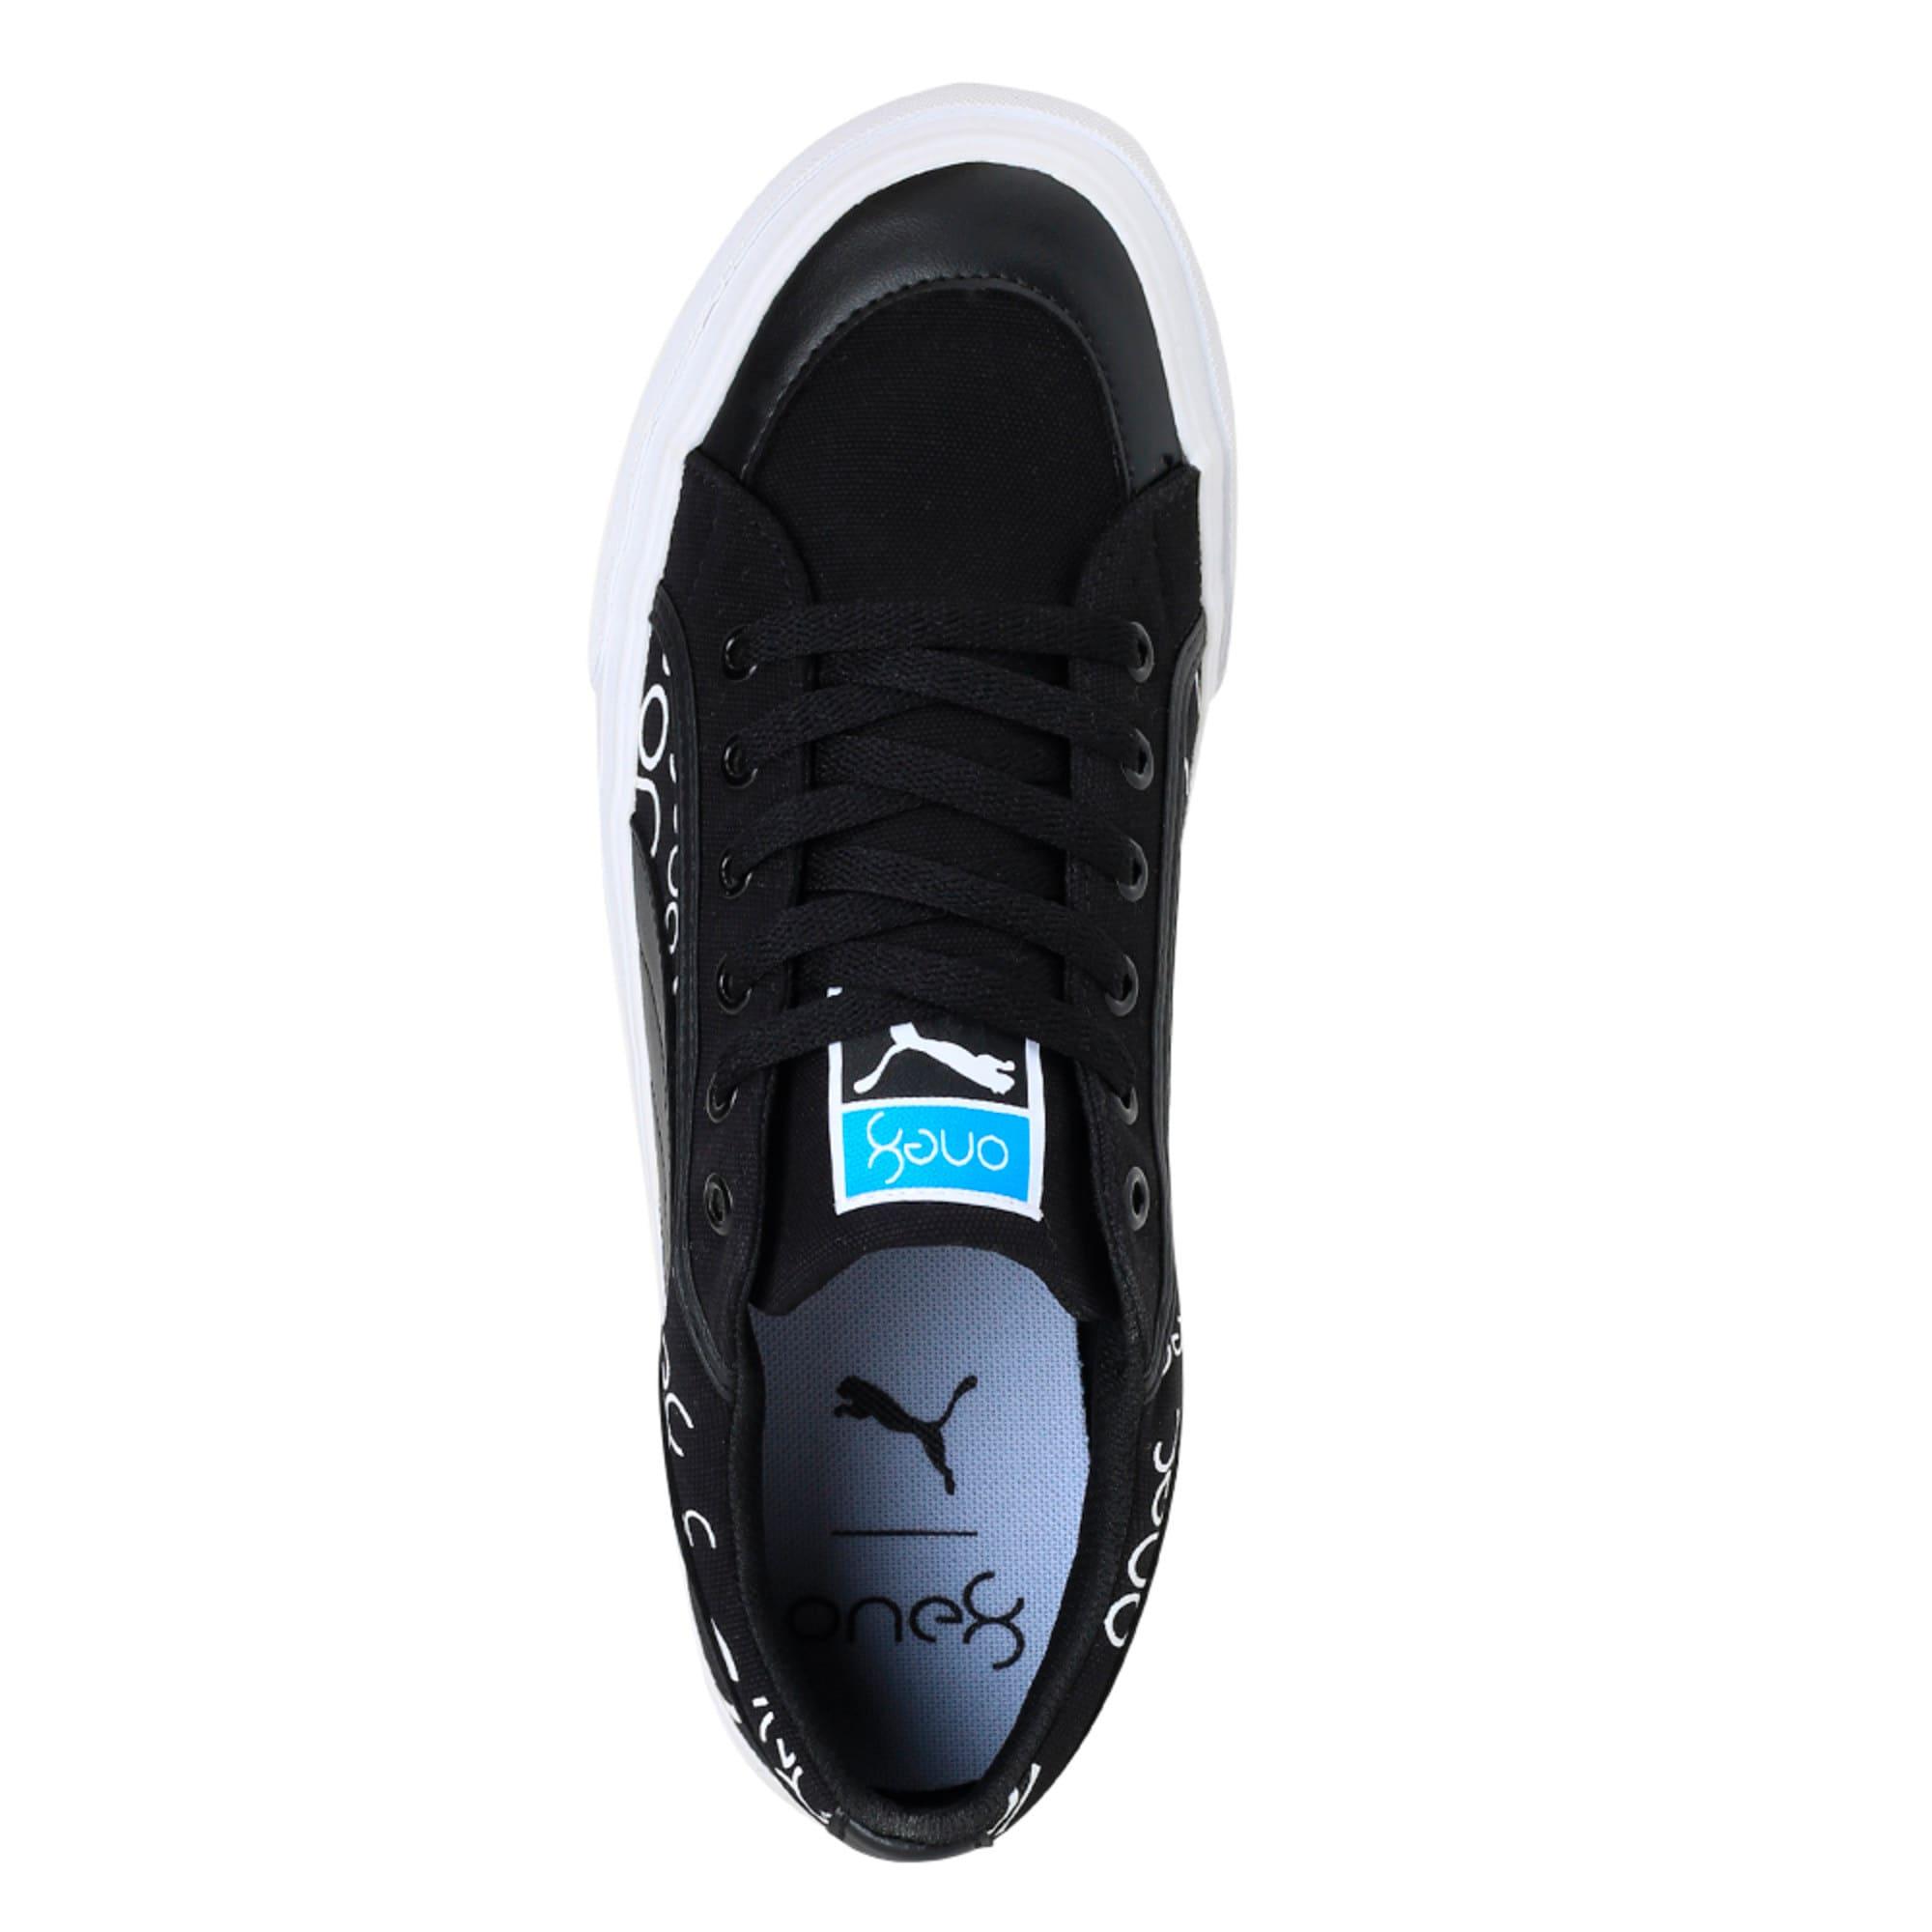 Thumbnail 3 of one8 Men's Sneakers, Black-White-Pomegranate, medium-IND